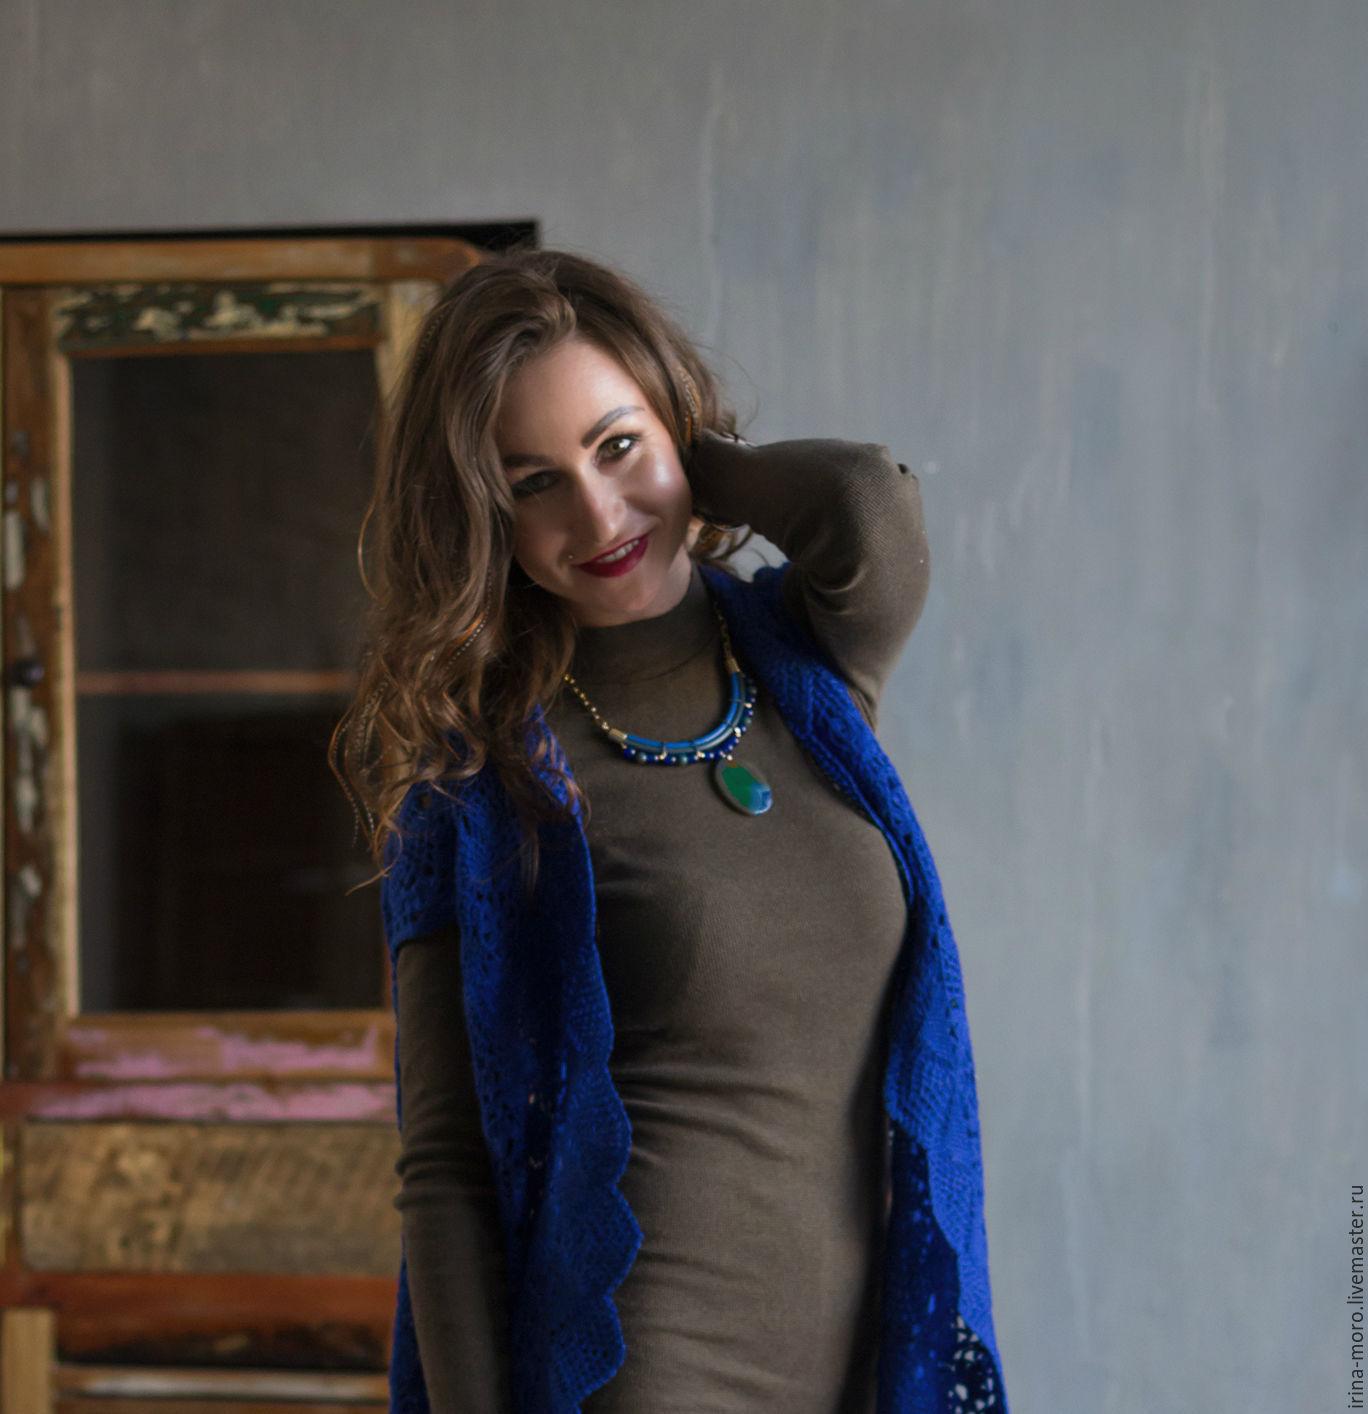 Irene Moreau. Irina Moro.  Necklace blue-green `Holland`. Handmade necklace. Multi-row necklace. Necklace with stone.